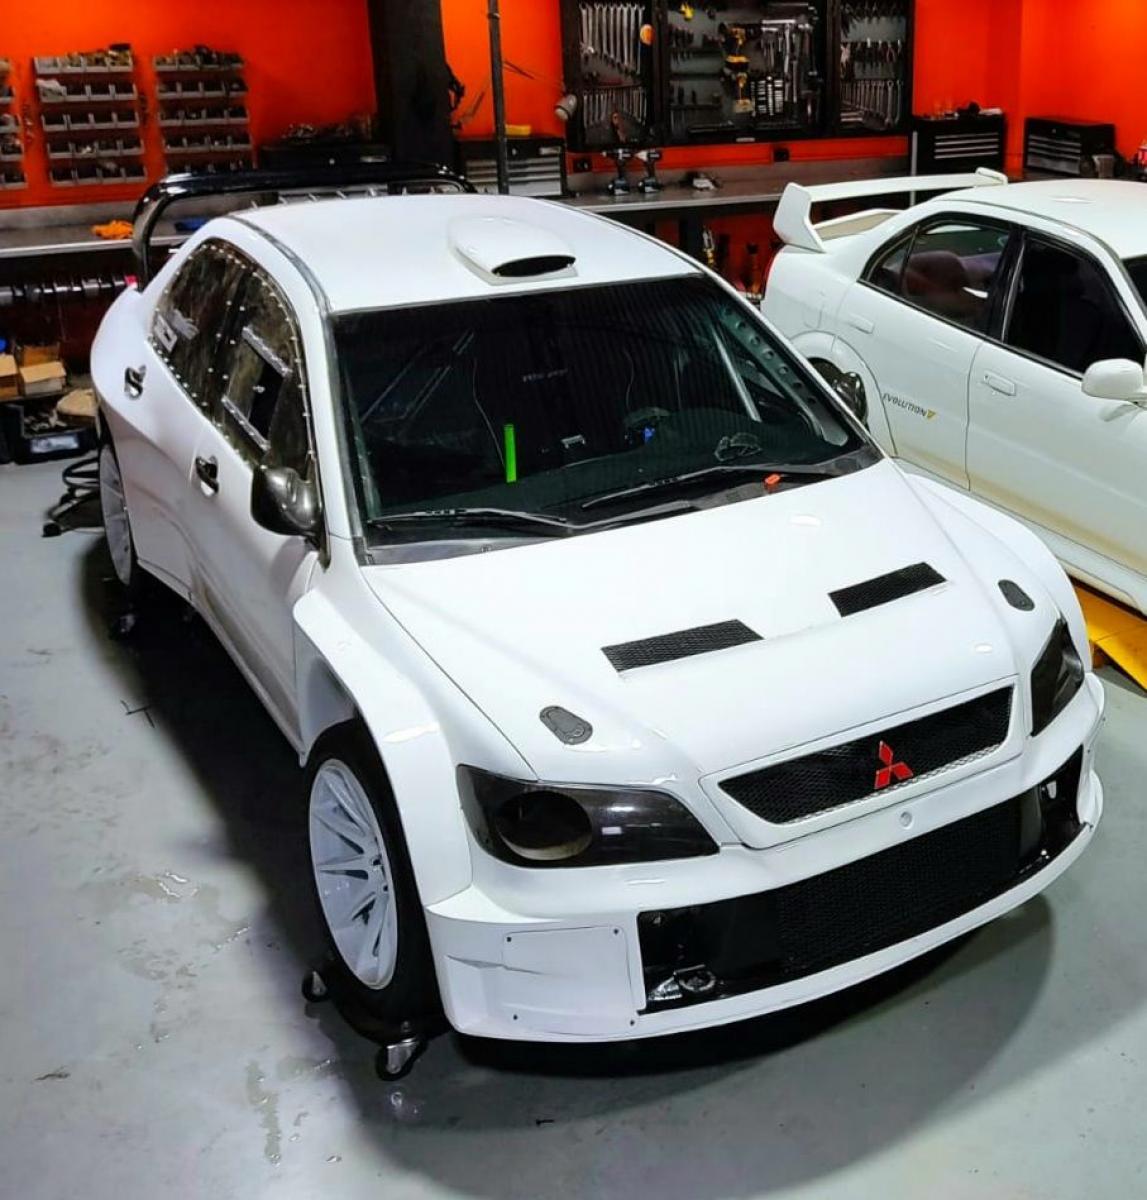 Mitsubishi Evo 9 WRC Replica - 1